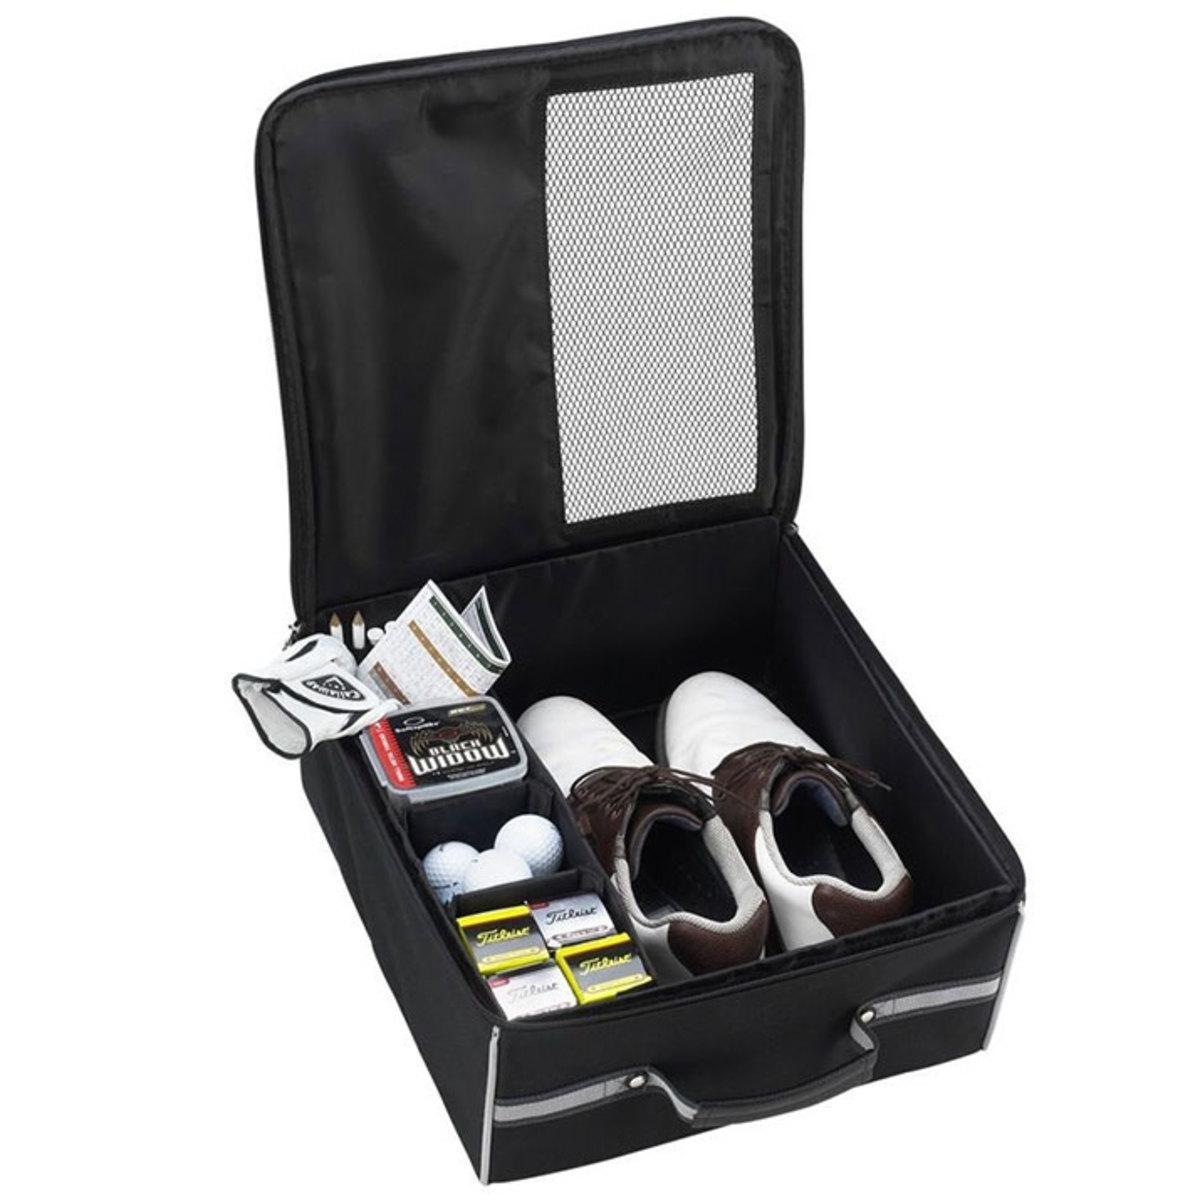 golf-trunk-organizer.jpg